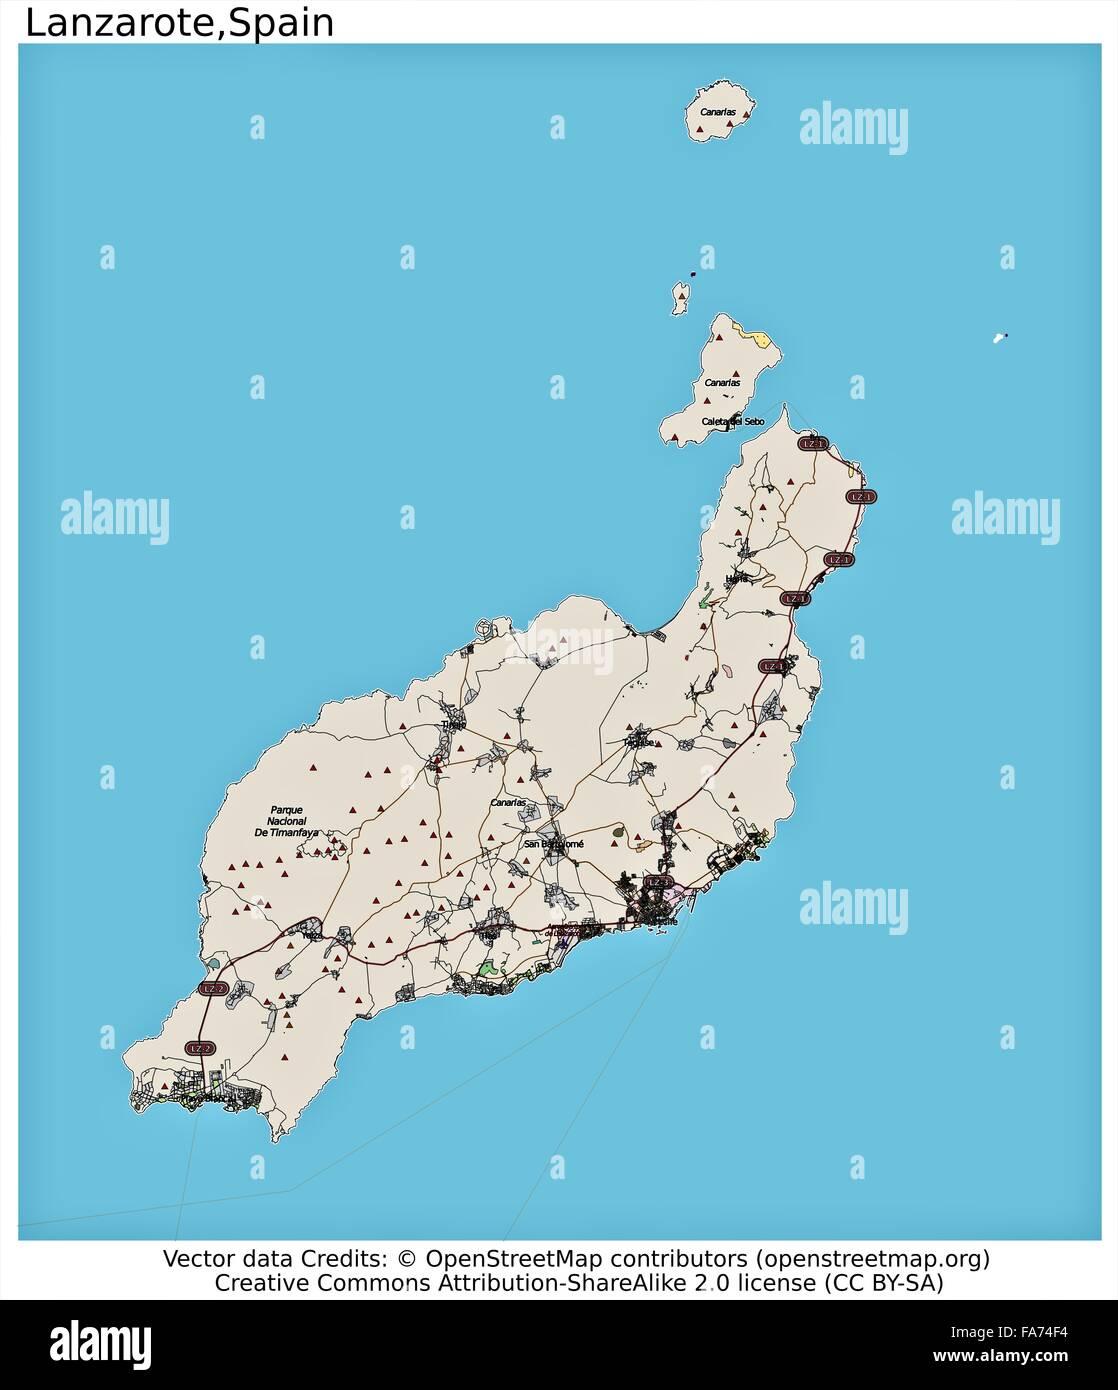 Map Of Spain Lanzarote.Lanzarote Spain Location Map Stock Photo 92355624 Alamy